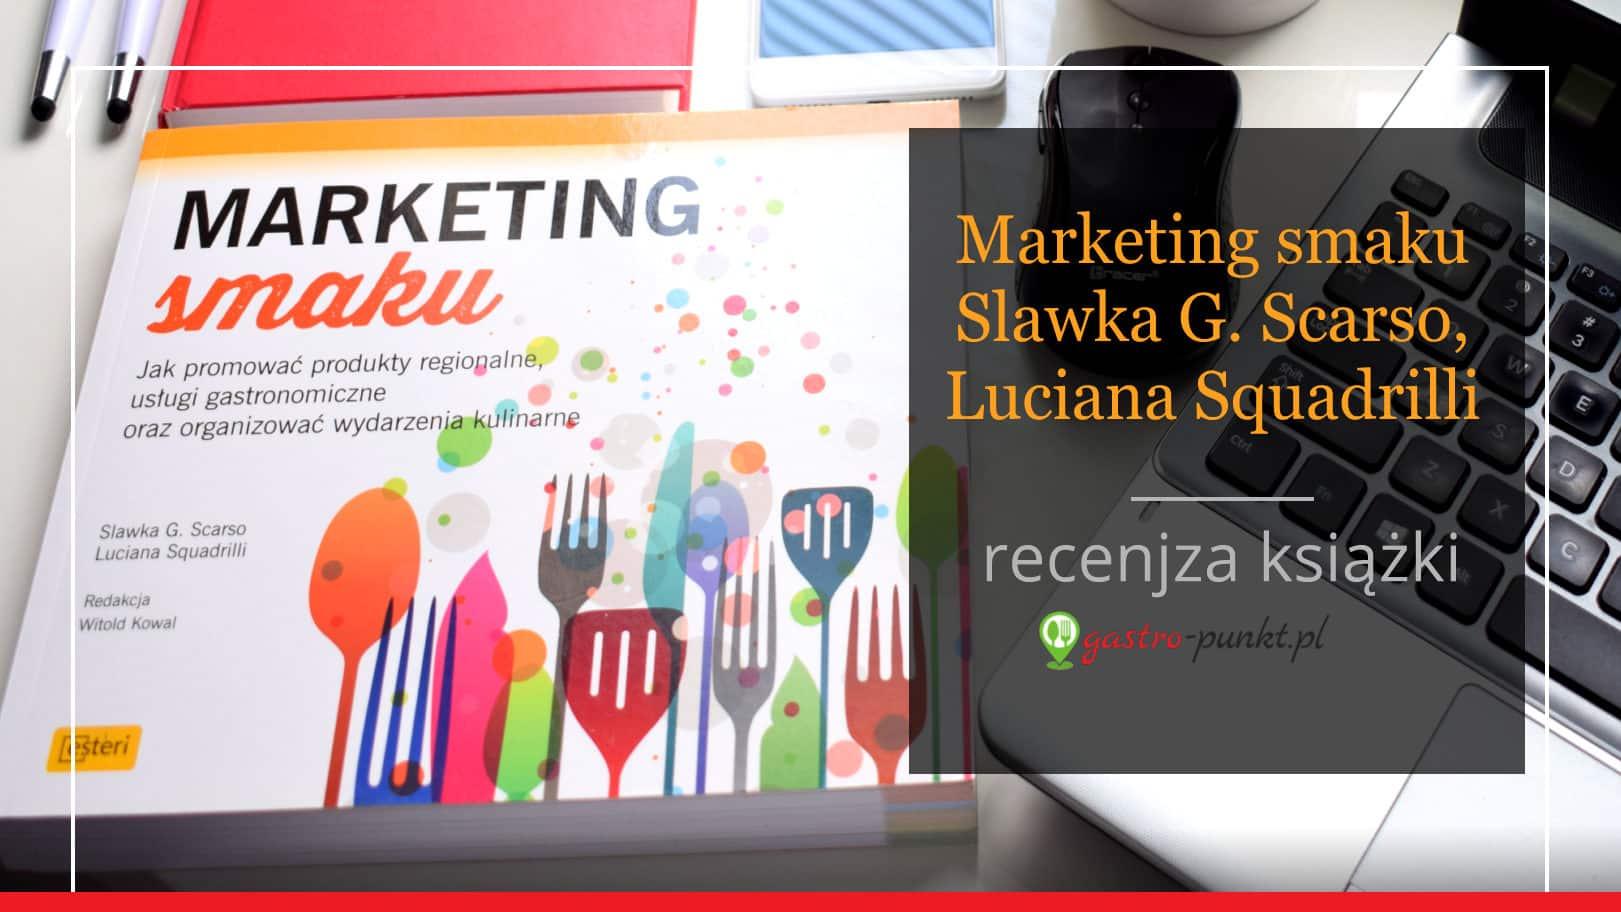 Marketing smaku Slawka G. Scarso, Luciana Squadrilli - recenzja książki